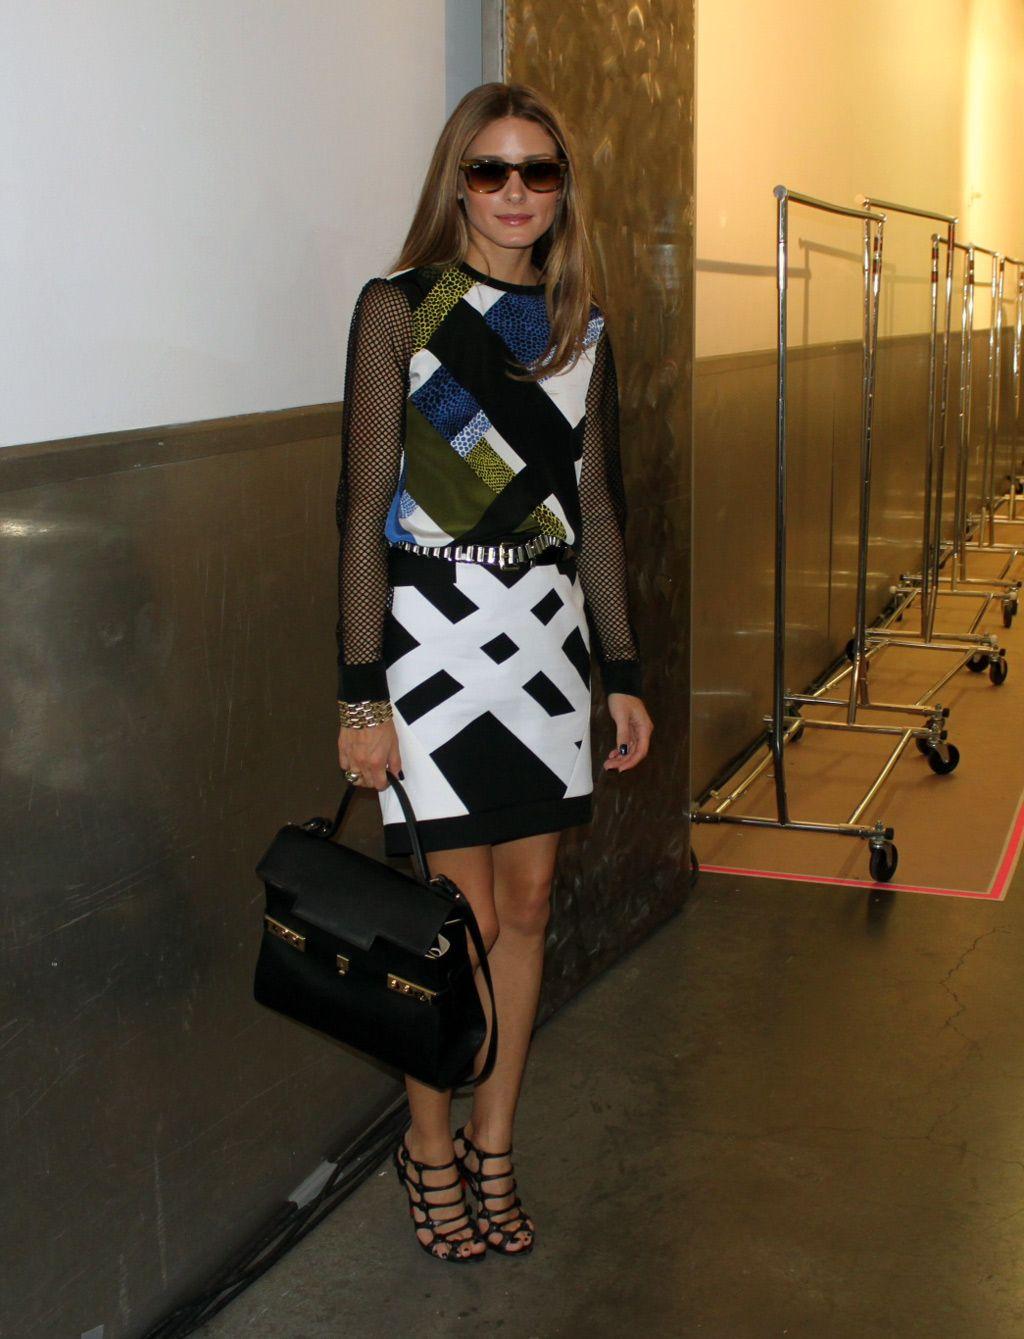 76ca5754b8d5 Olivia Palermo wearing a Tibi Nelio Mesh Sleeve Top and Transit Yoked  Skirt